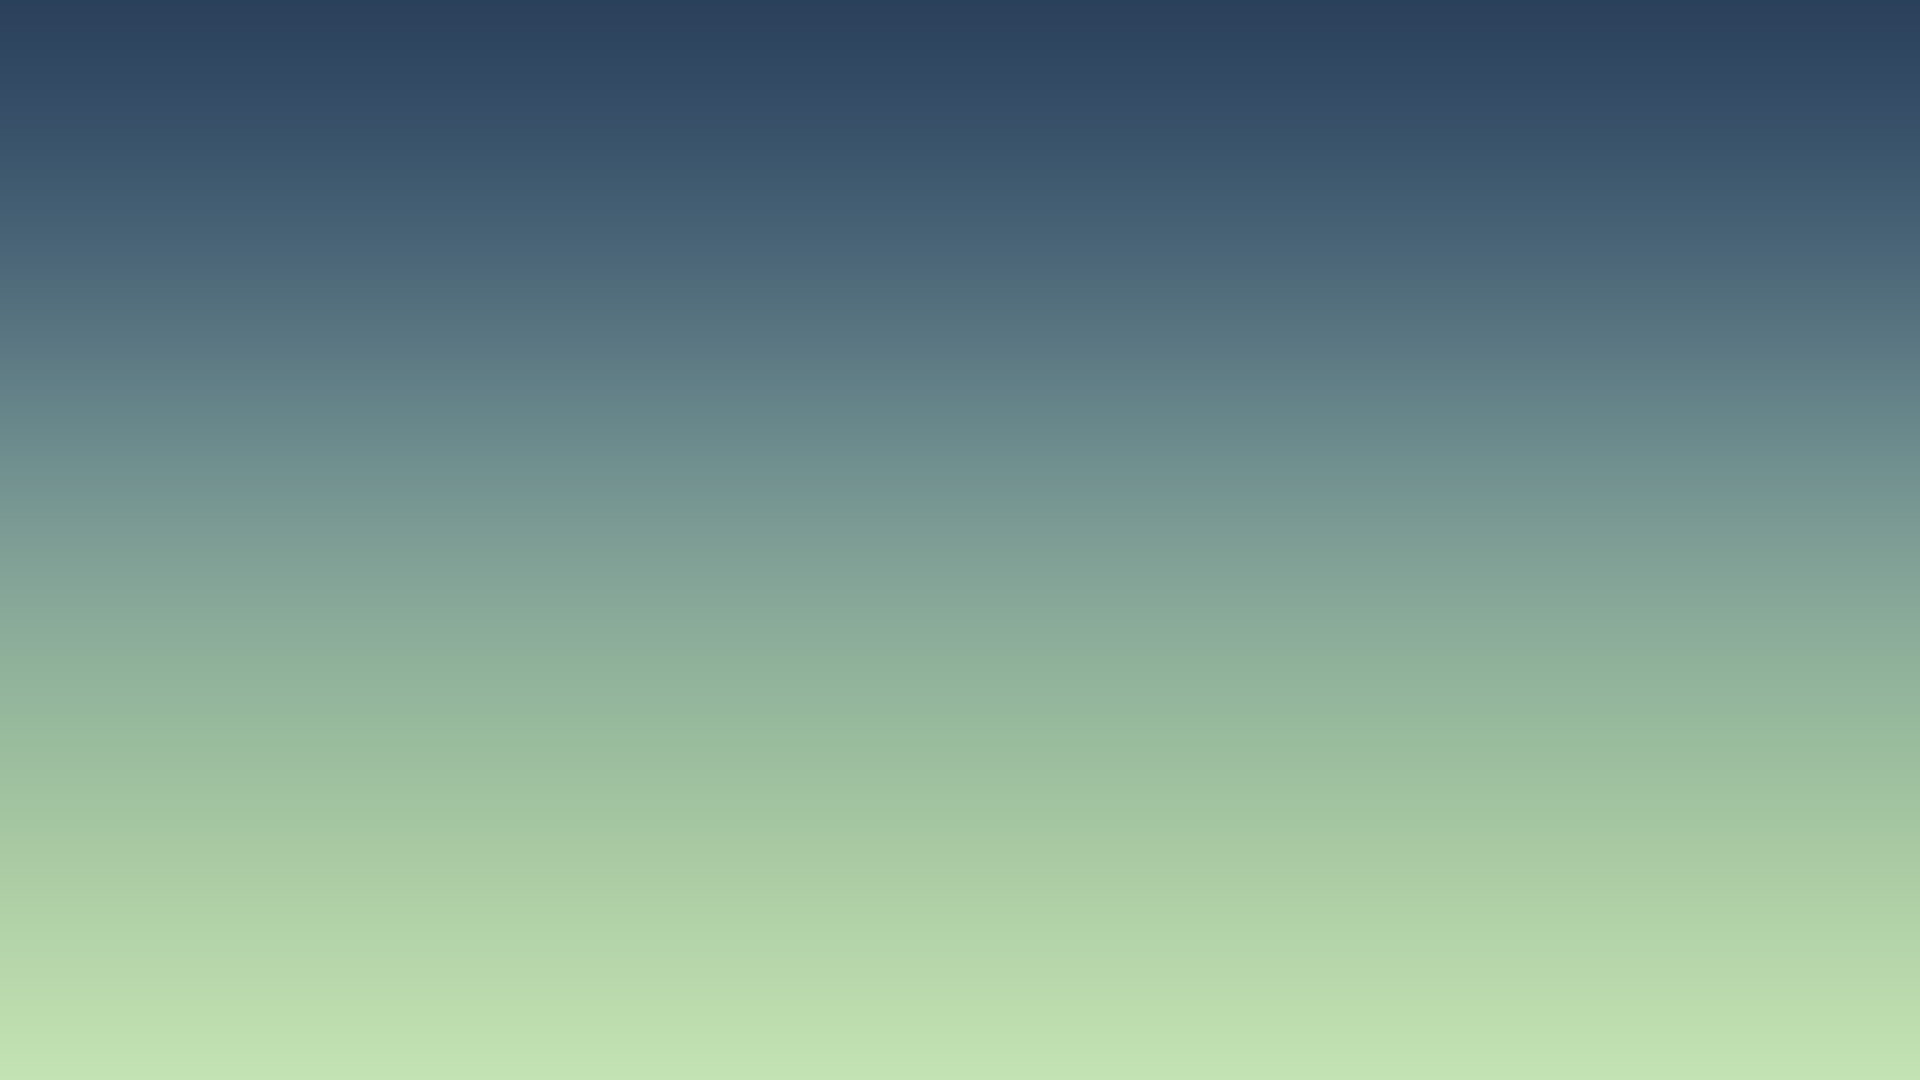 Fall Desktop Wallpaper For Mac Sk89 Blue Old Ipad Background Blur Gradation Wallpaper